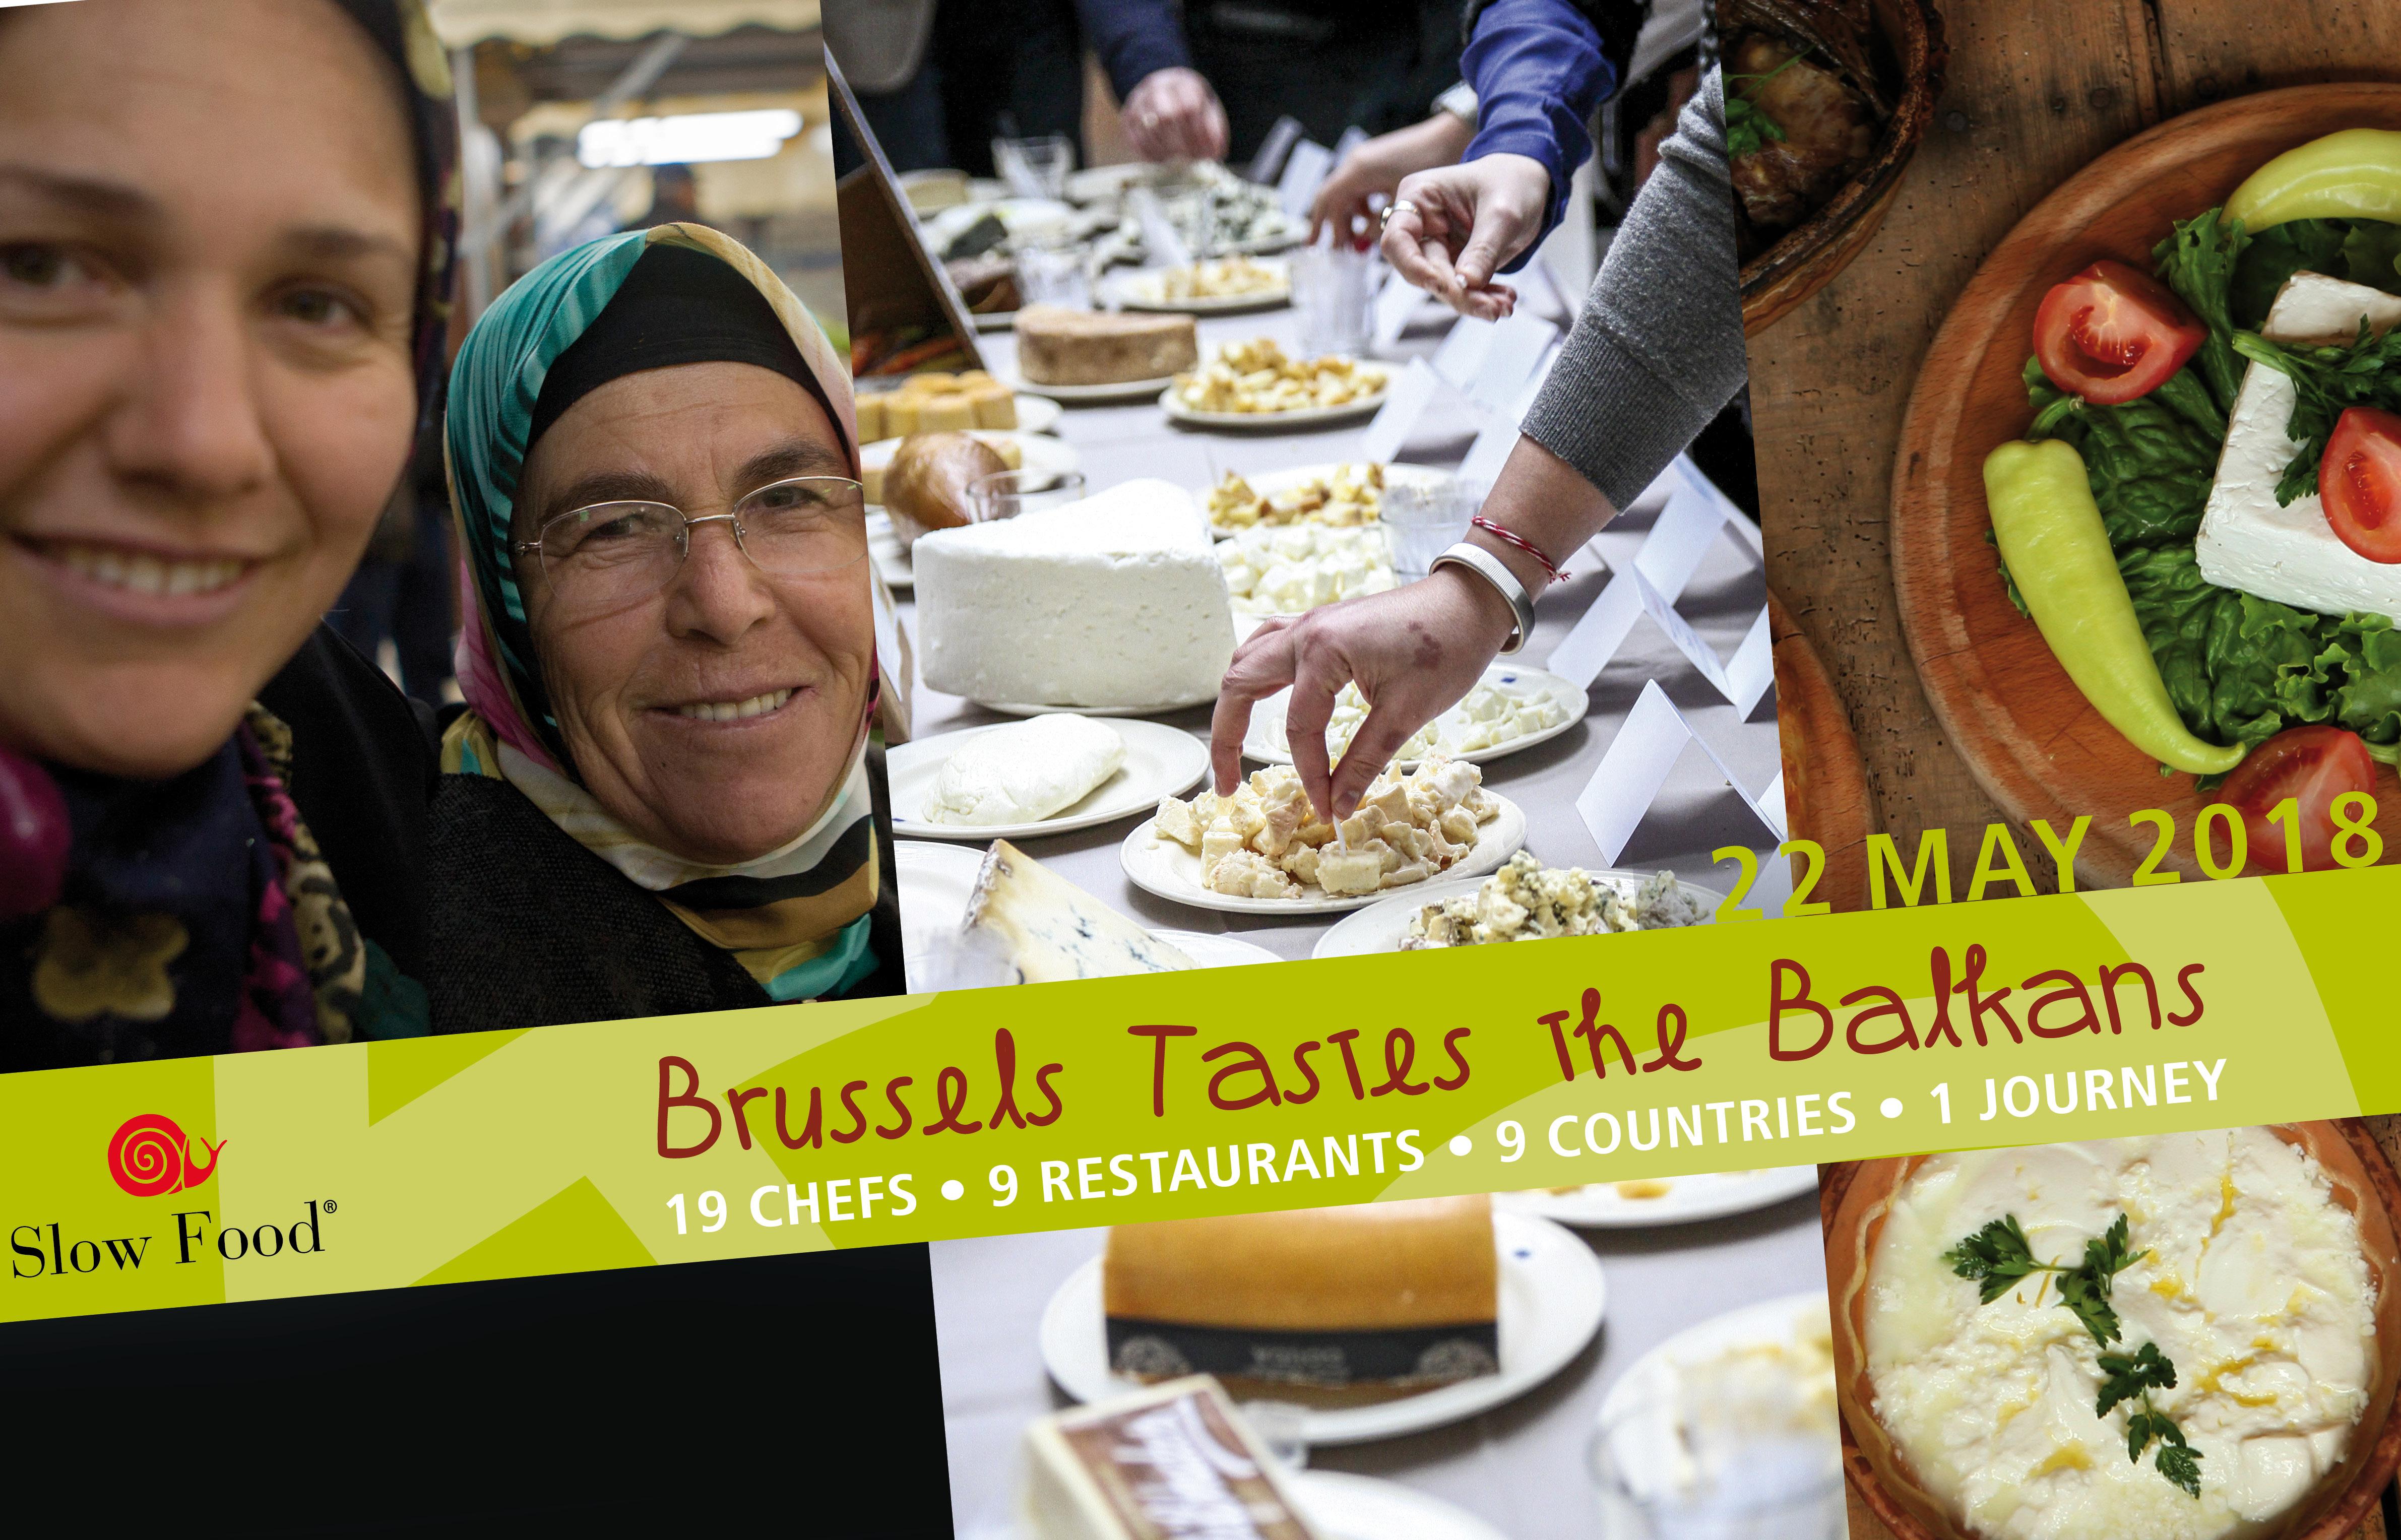 brussels-tastes-balkans